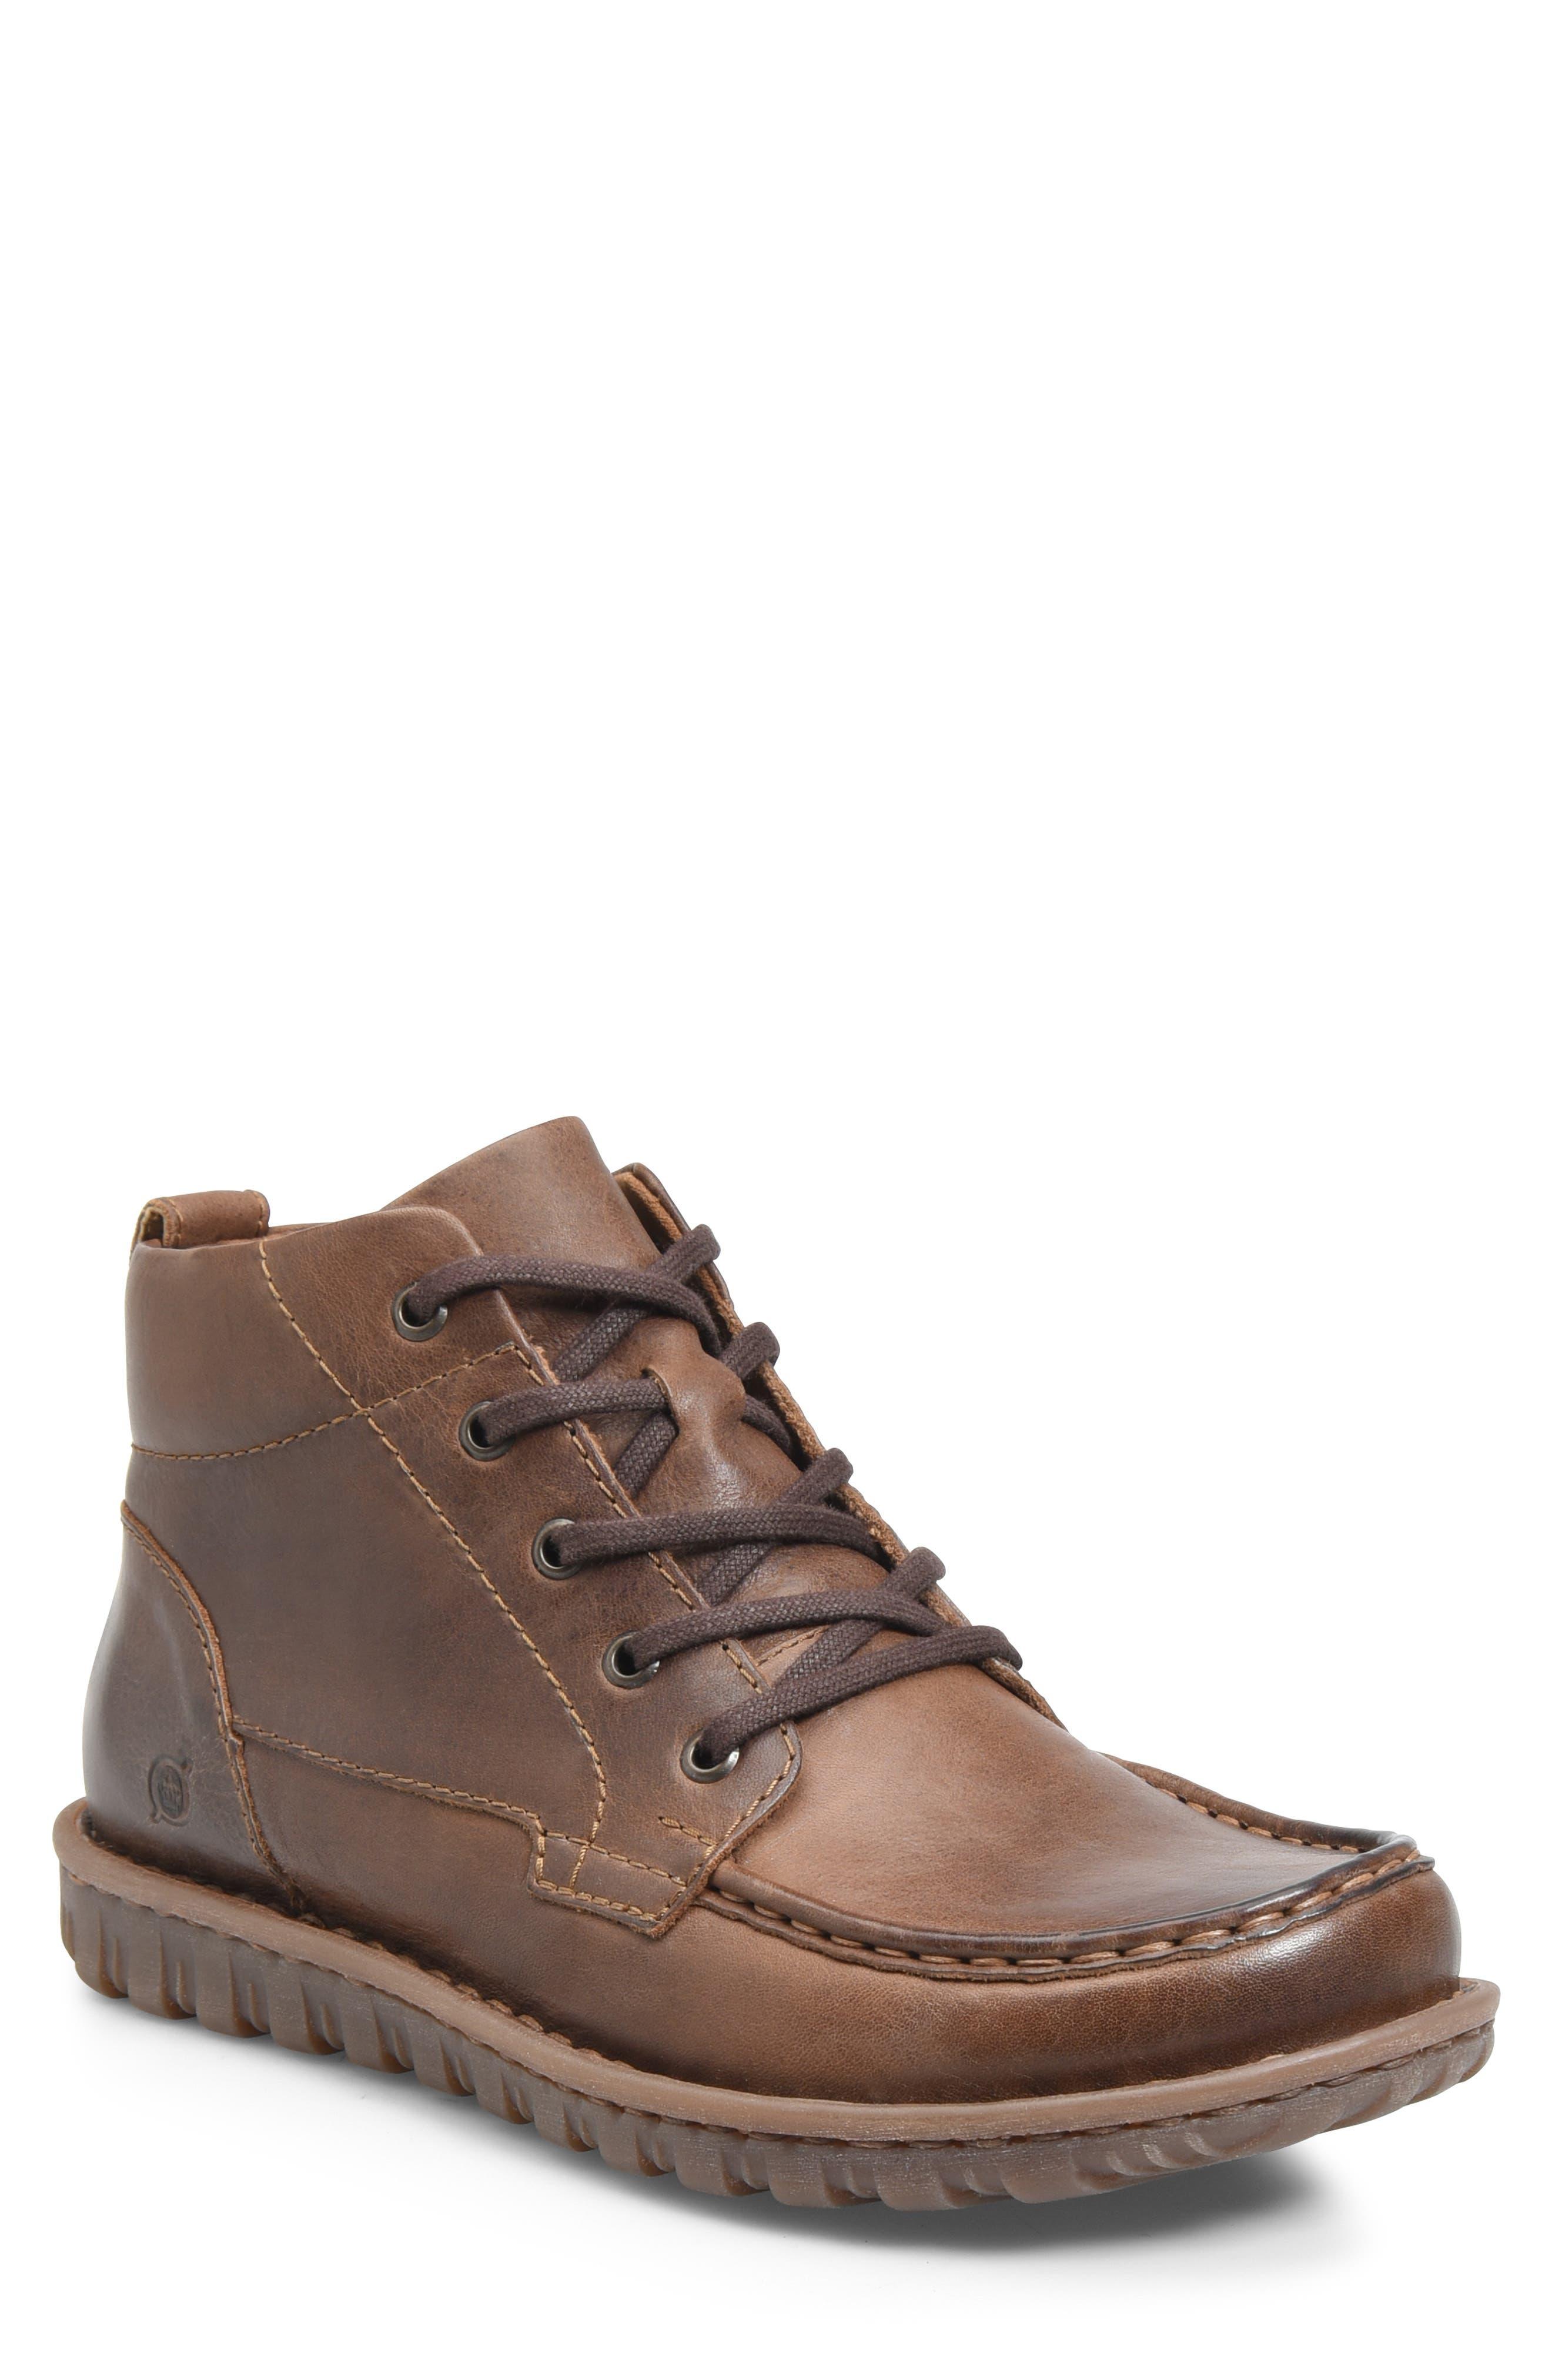 B?rn Gilden Moc Toe Boot- Brown